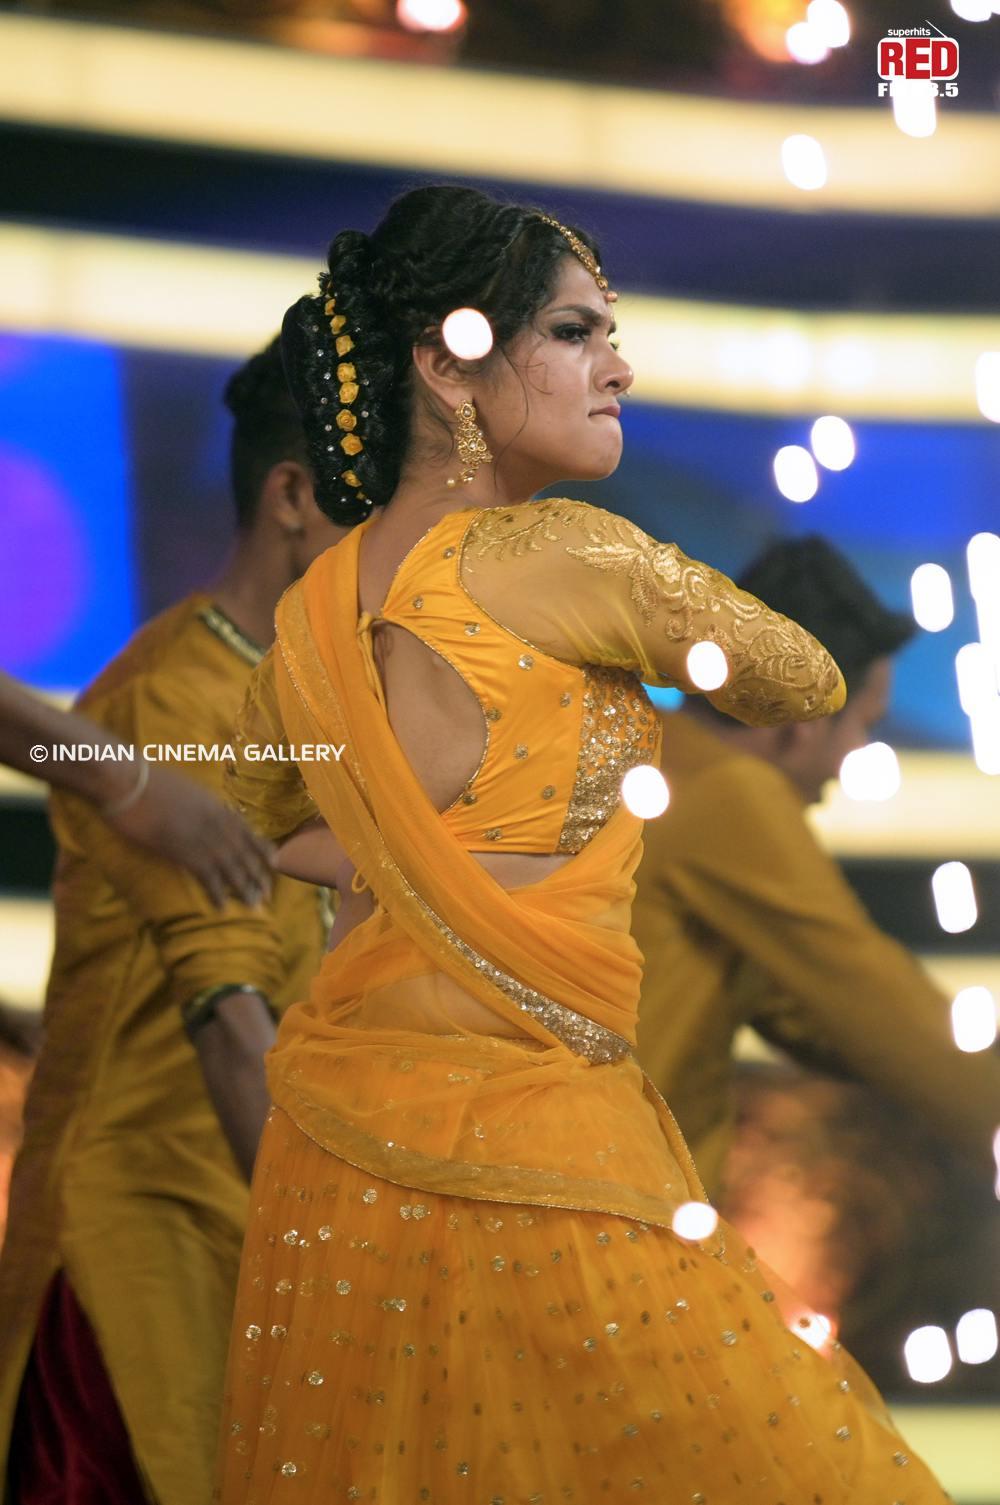 Gayathri Suresh dance at red fm music awards 2019 (23)